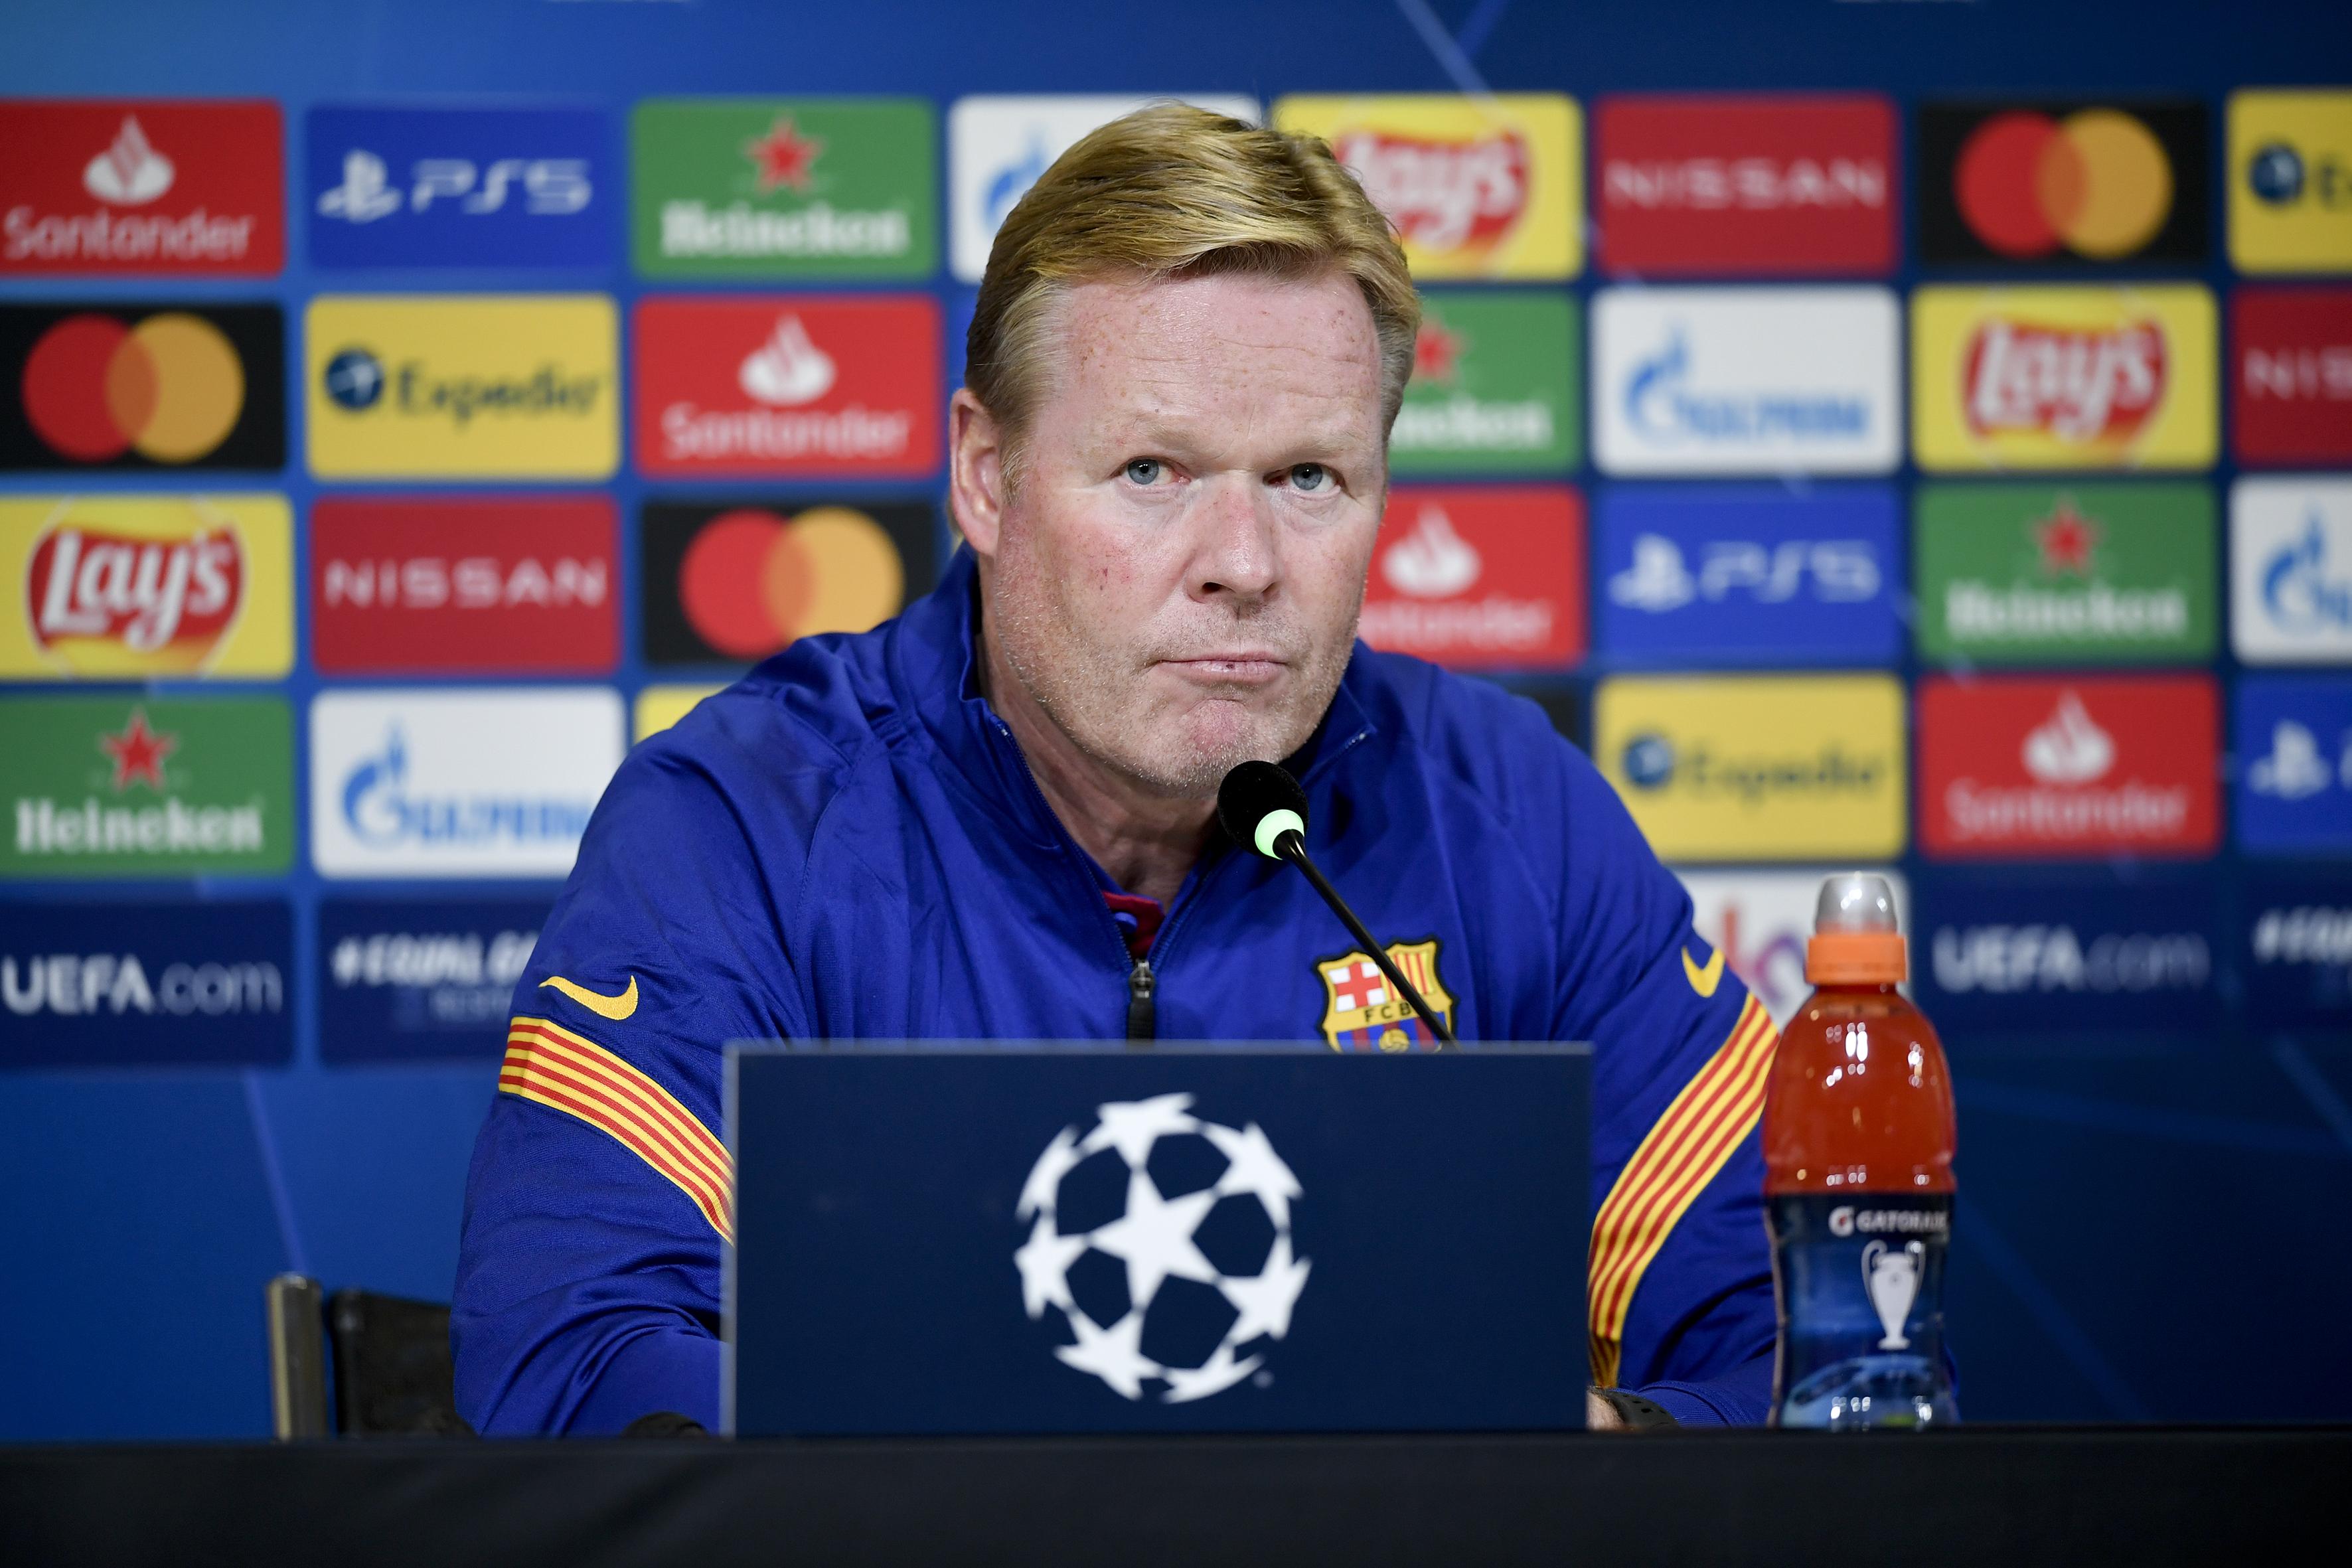 Barcelona Press Conference